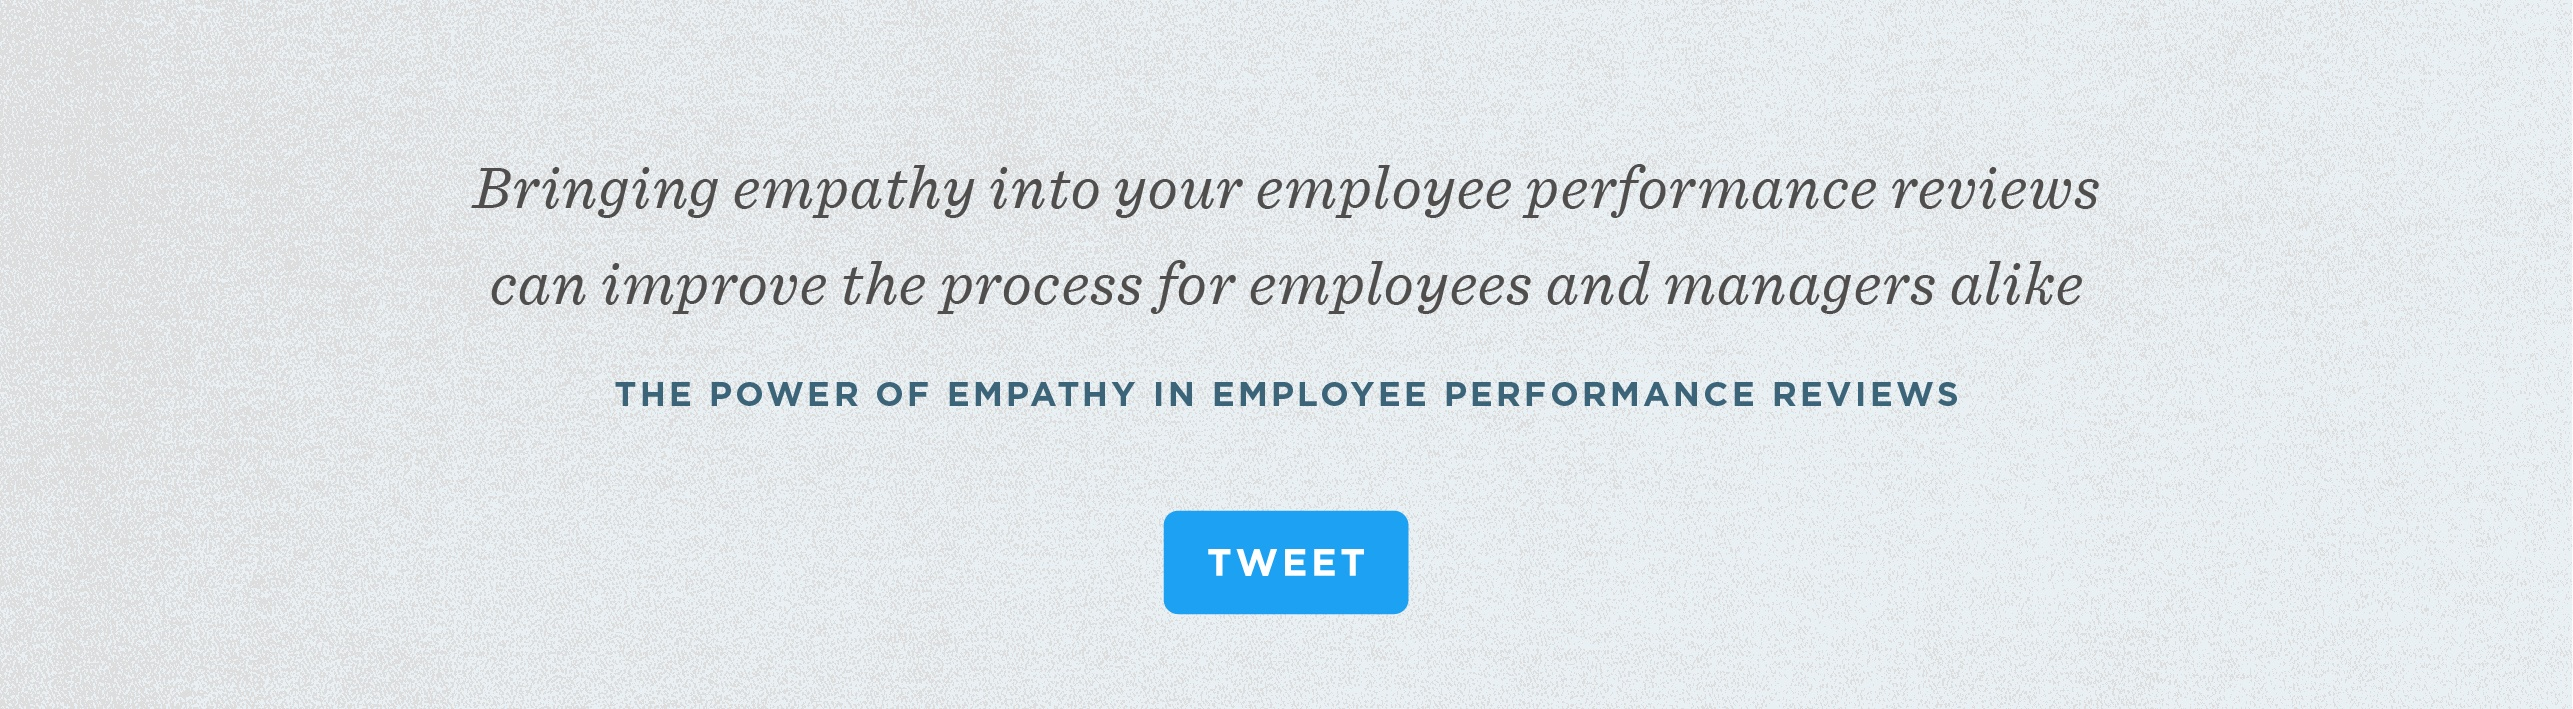 employee performance reviews.jpg